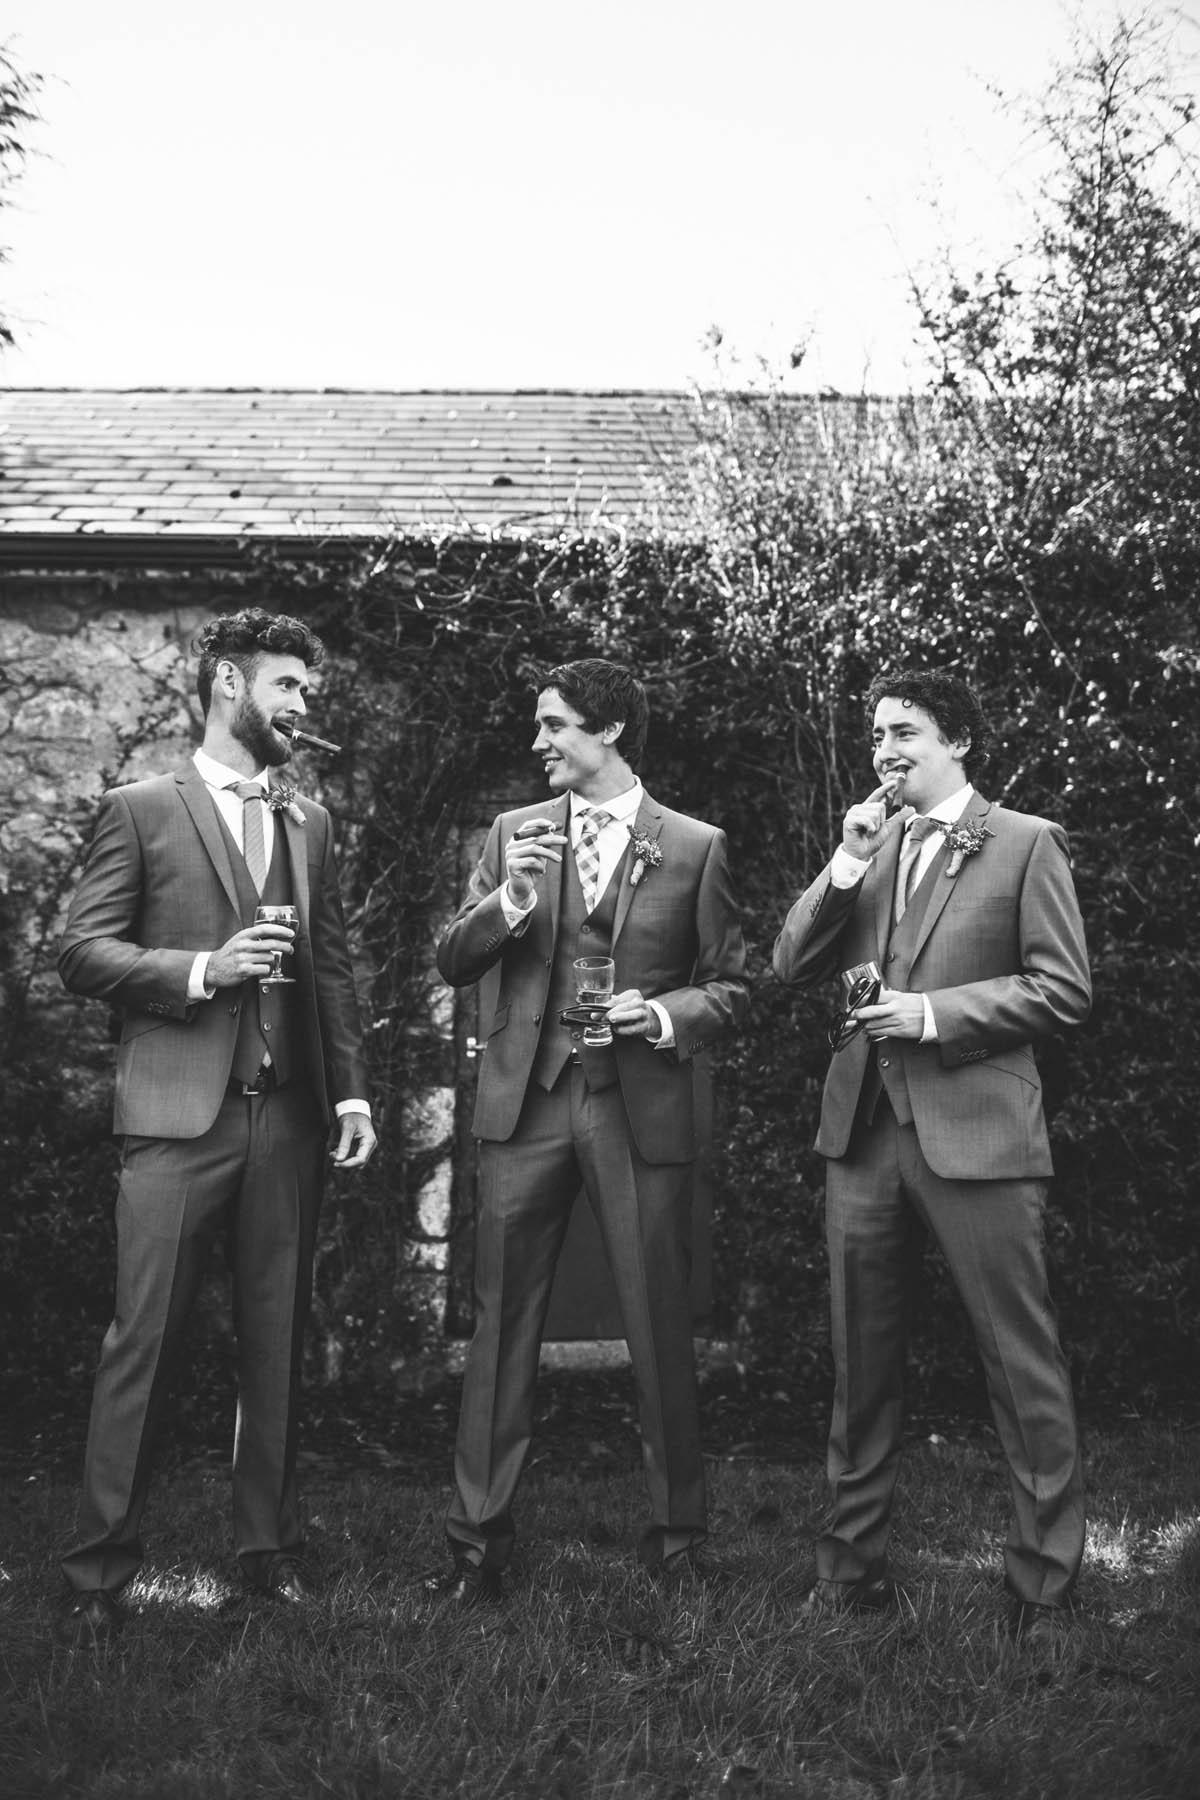 Photos of Sarah & Malcolm's wedding at Mount Druid taken by Rubistyle.